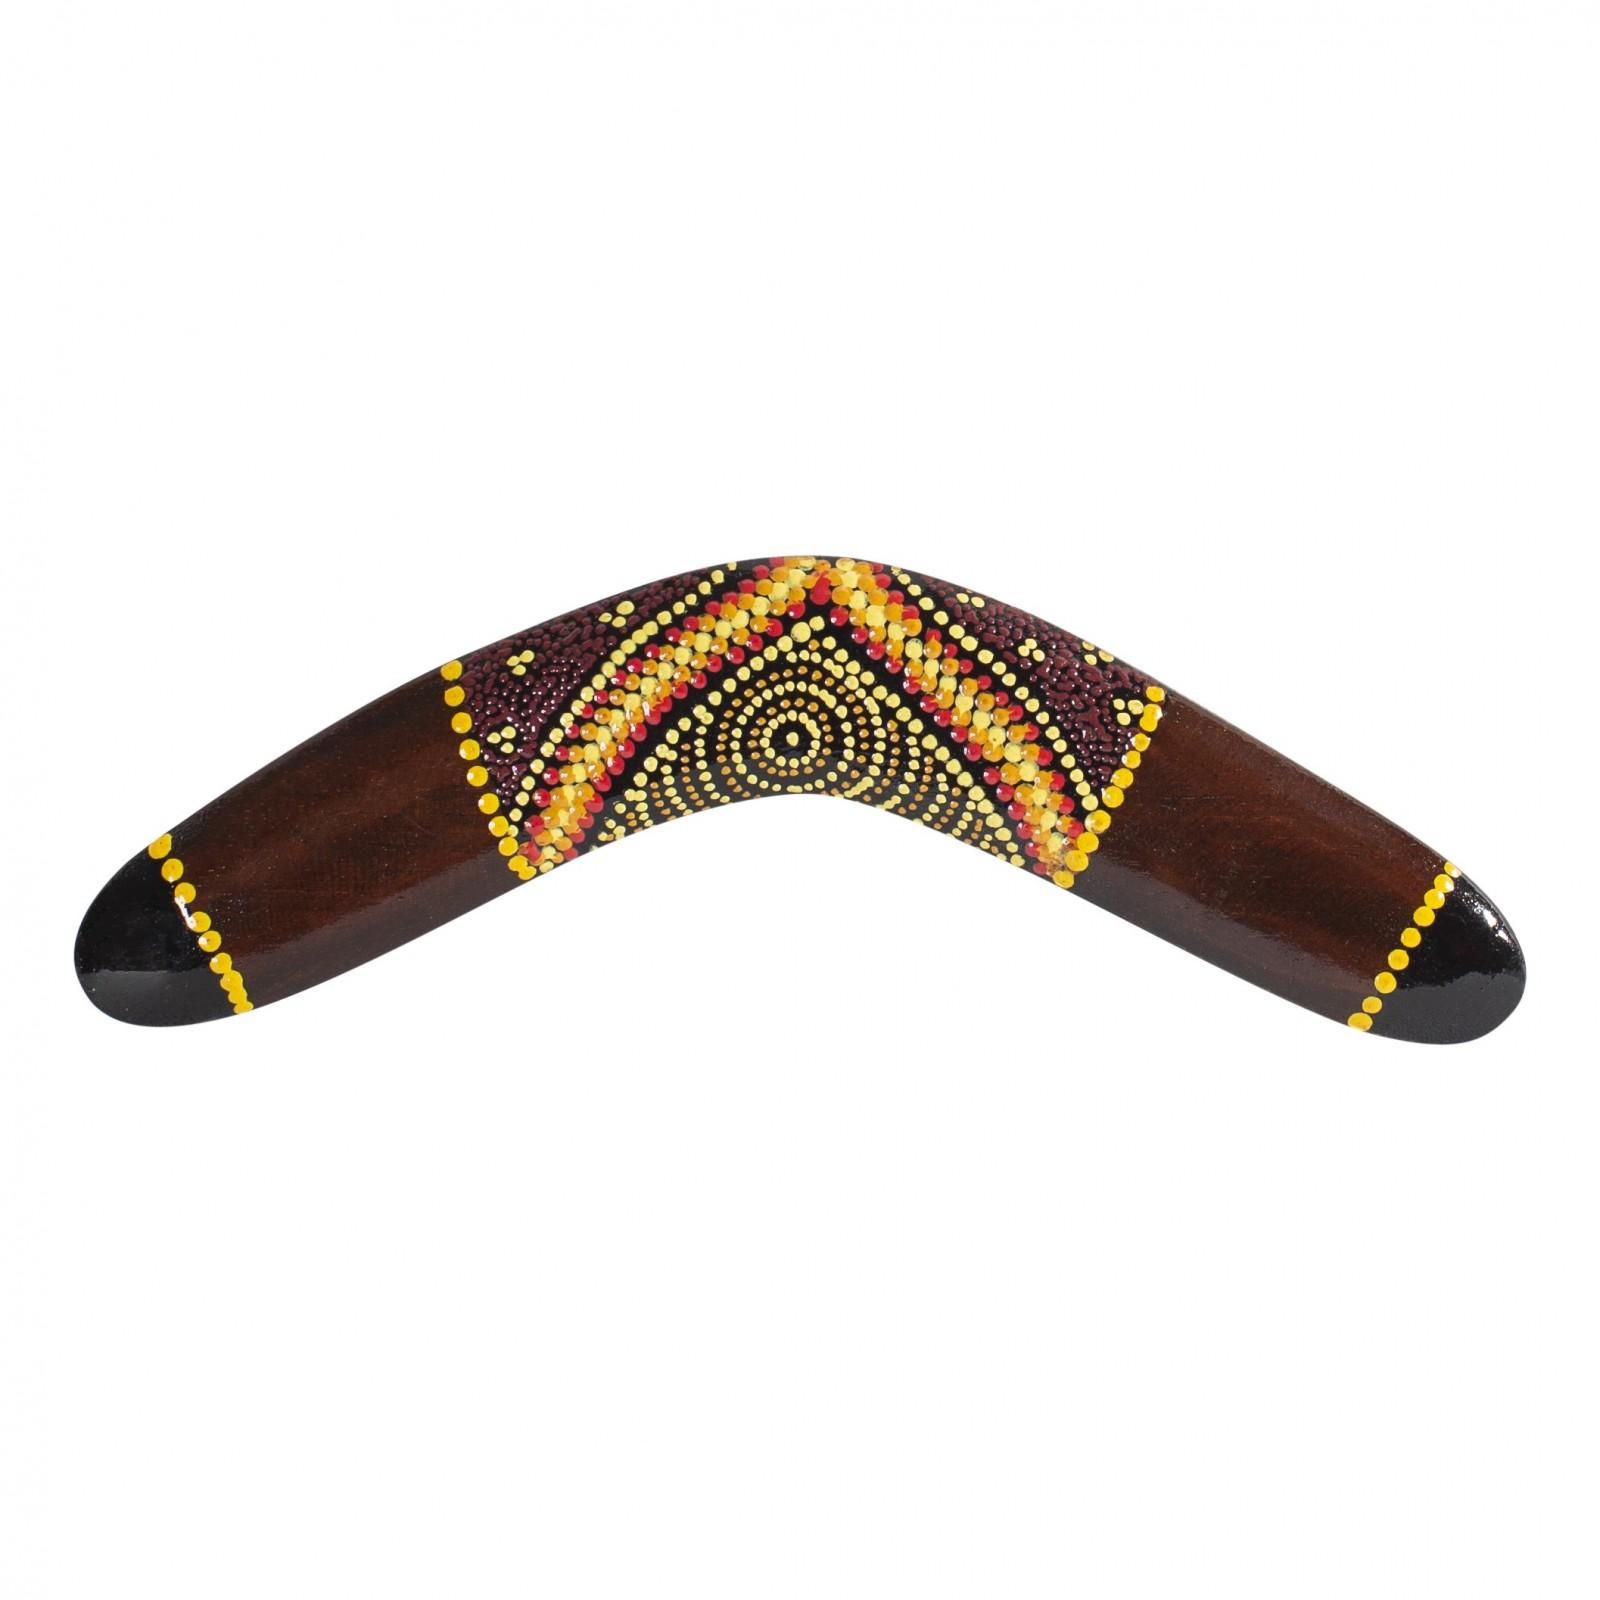 Australian Treasures boemerang 30cm bruin hout